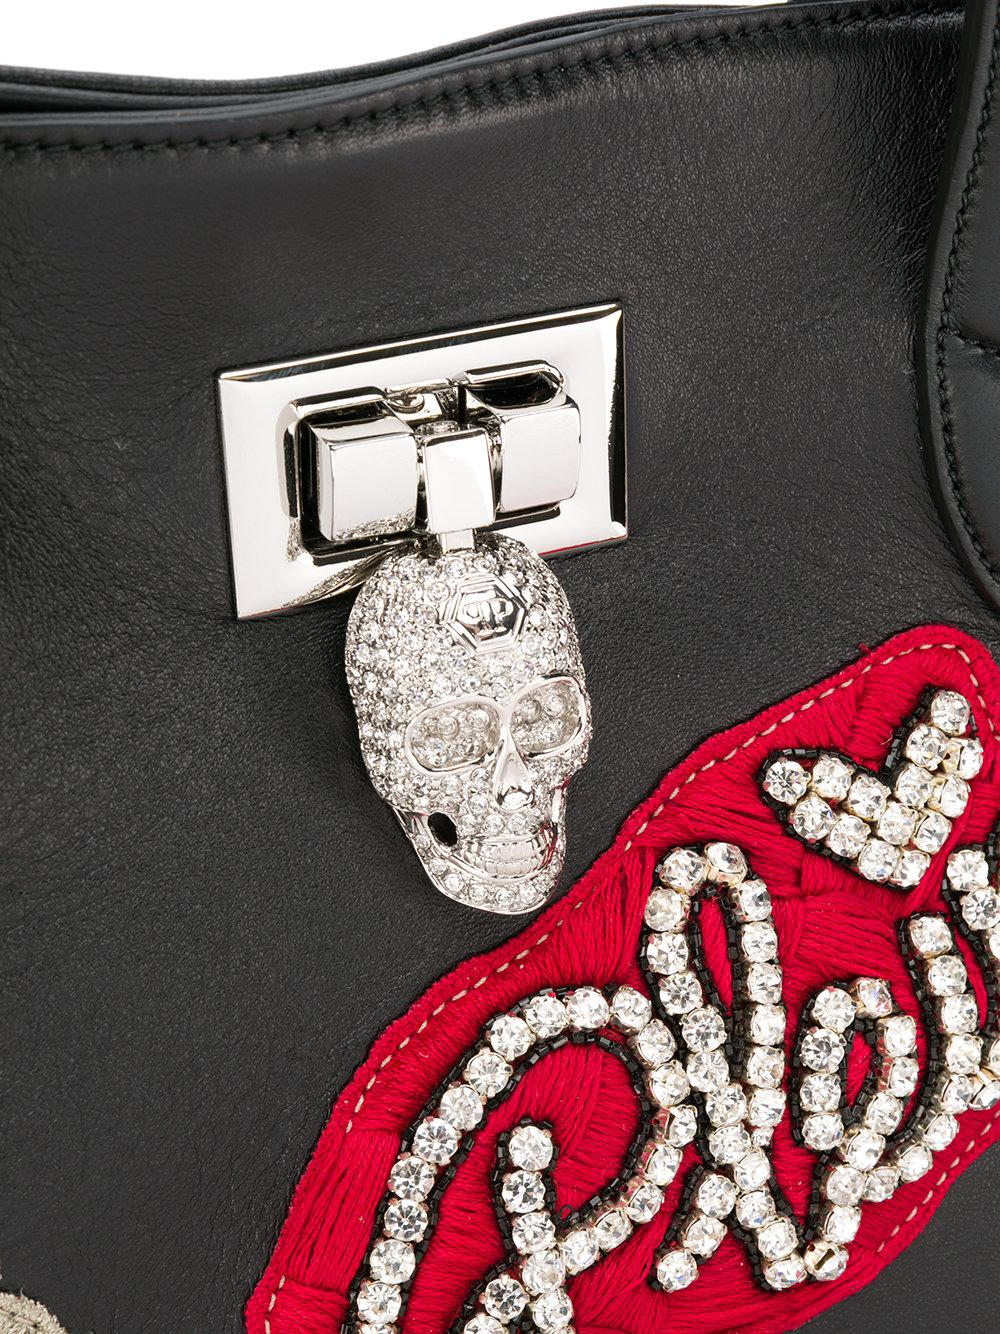 Philipp Plein Leather Floral Appliqué Tote Bag in Black